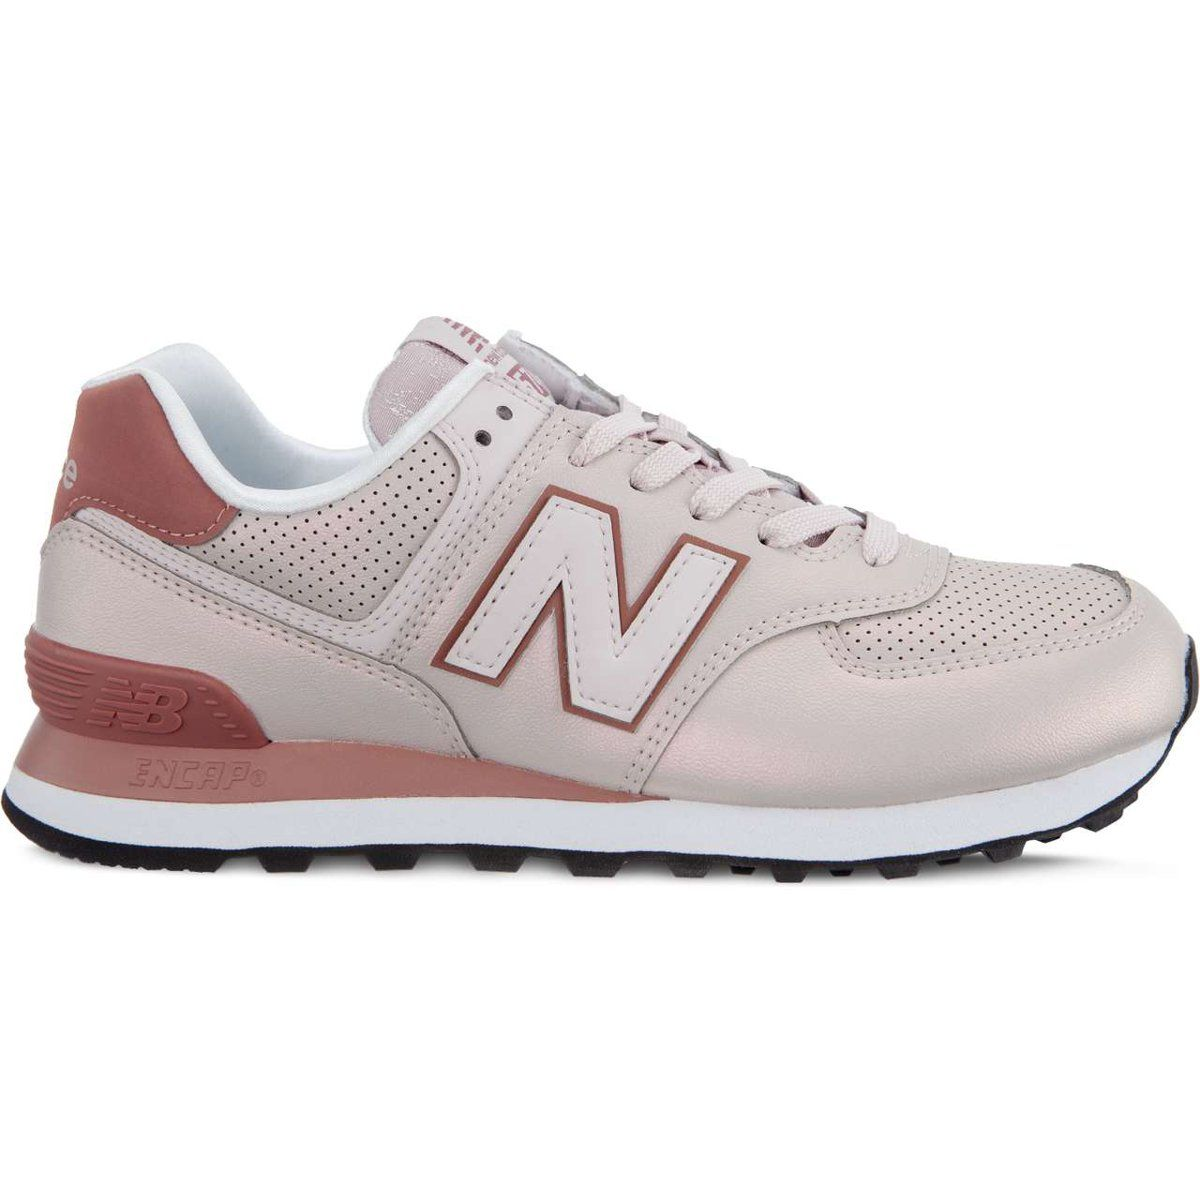 Sportowe Damskie Newbalance New Balance Wl574kse Sheen Pack Conch Shell With Dark Oxide New Balance New Balance Sneaker Shoes